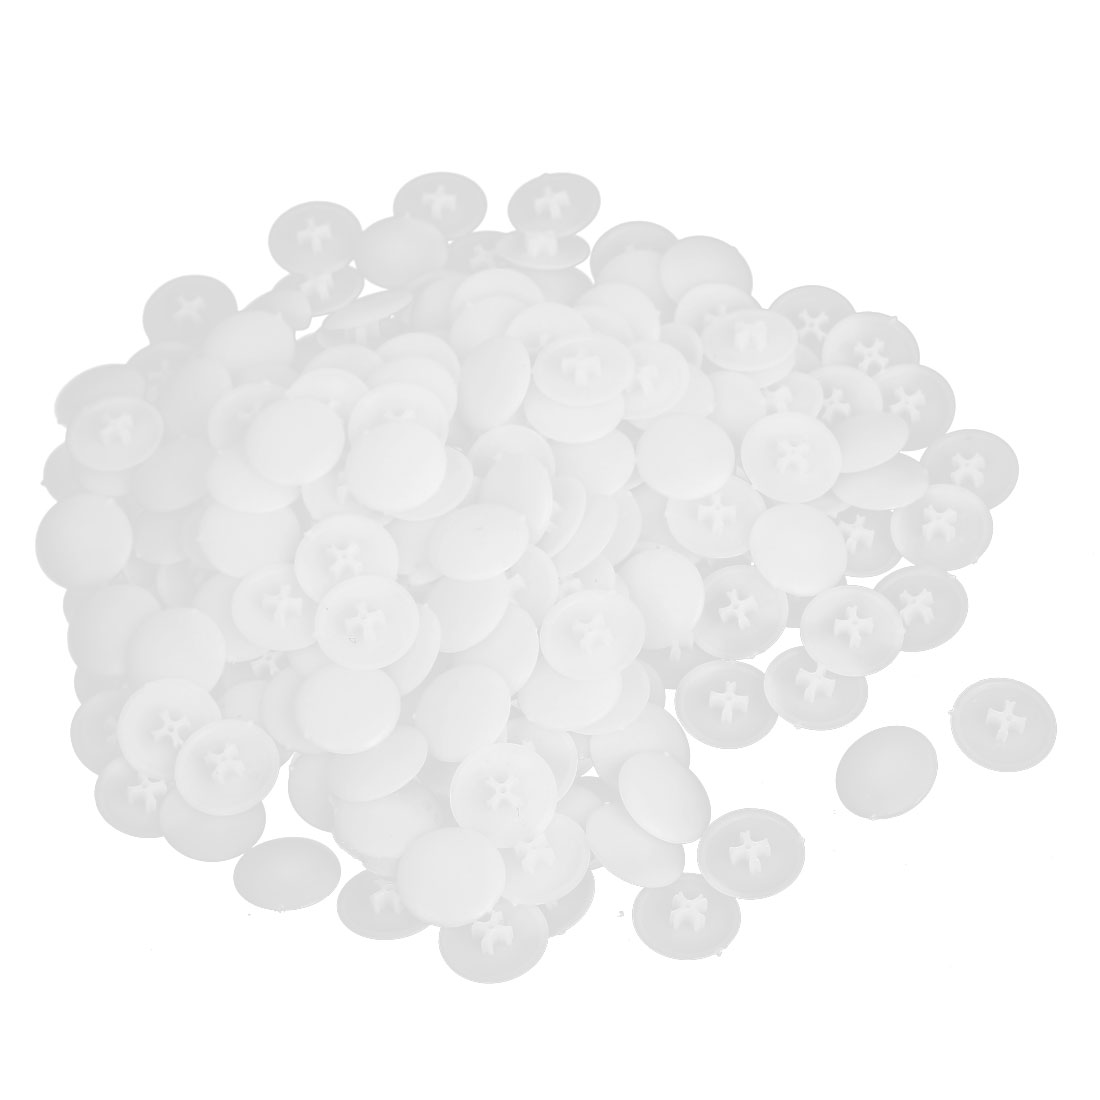 White Plastic Round Caps Furniture Press Fit Pozi Bolts Screws Cover 300pcs